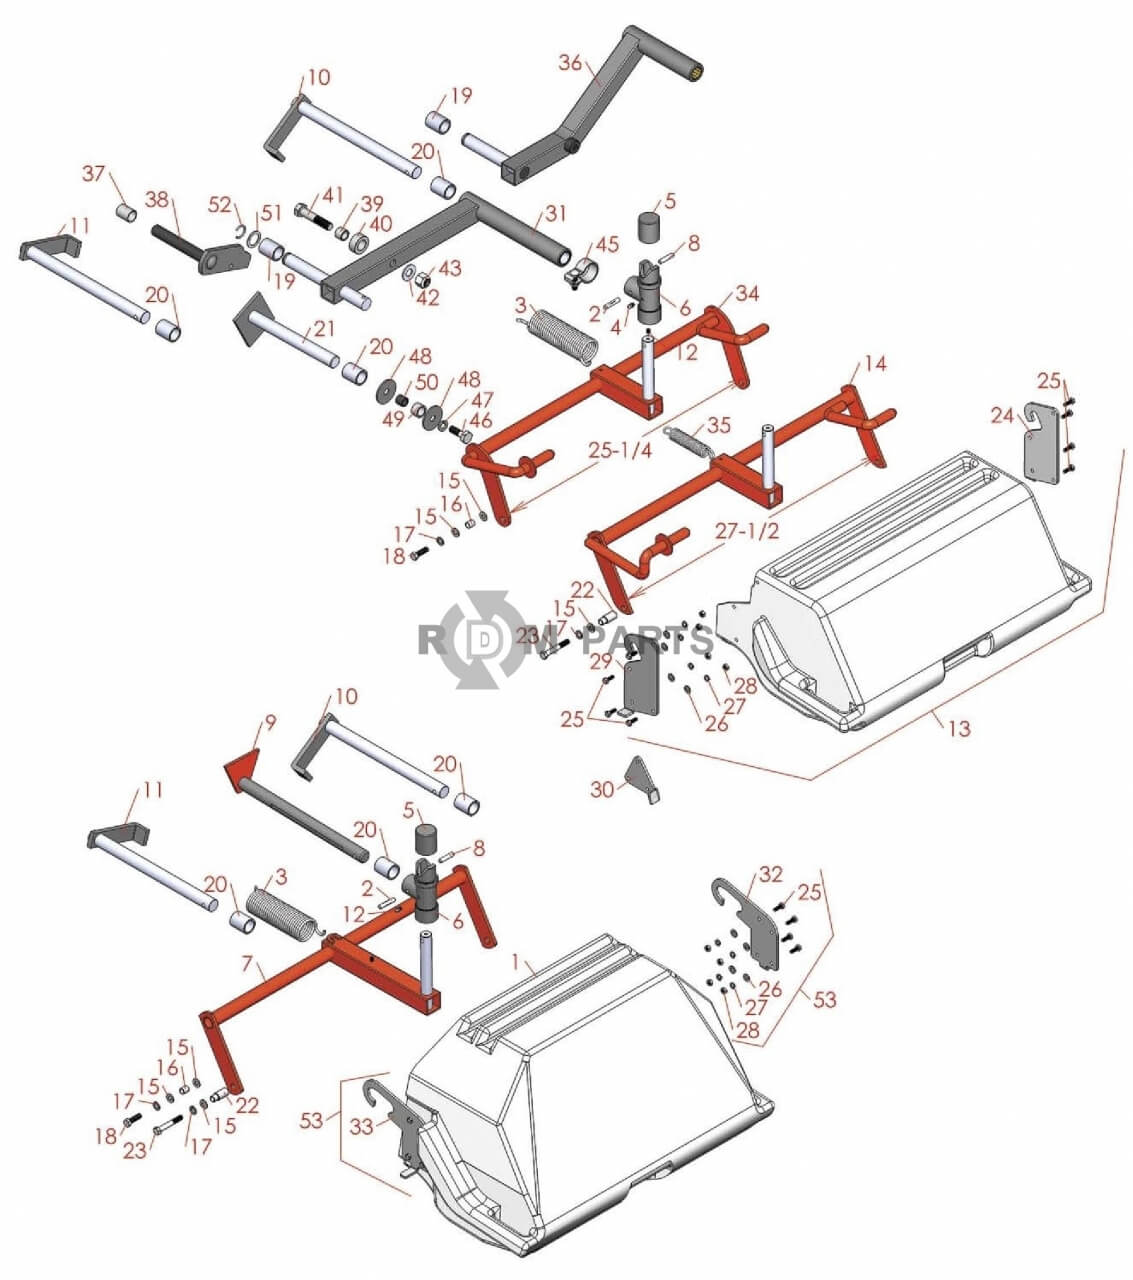 d5d82a5f 8534 41a9 8866 37b9a5723b7c?size\\\\\\\\\\\\\\\=medium trail wagon wiring diagram electrical diagrams, engine diagrams  at suagrazia.org